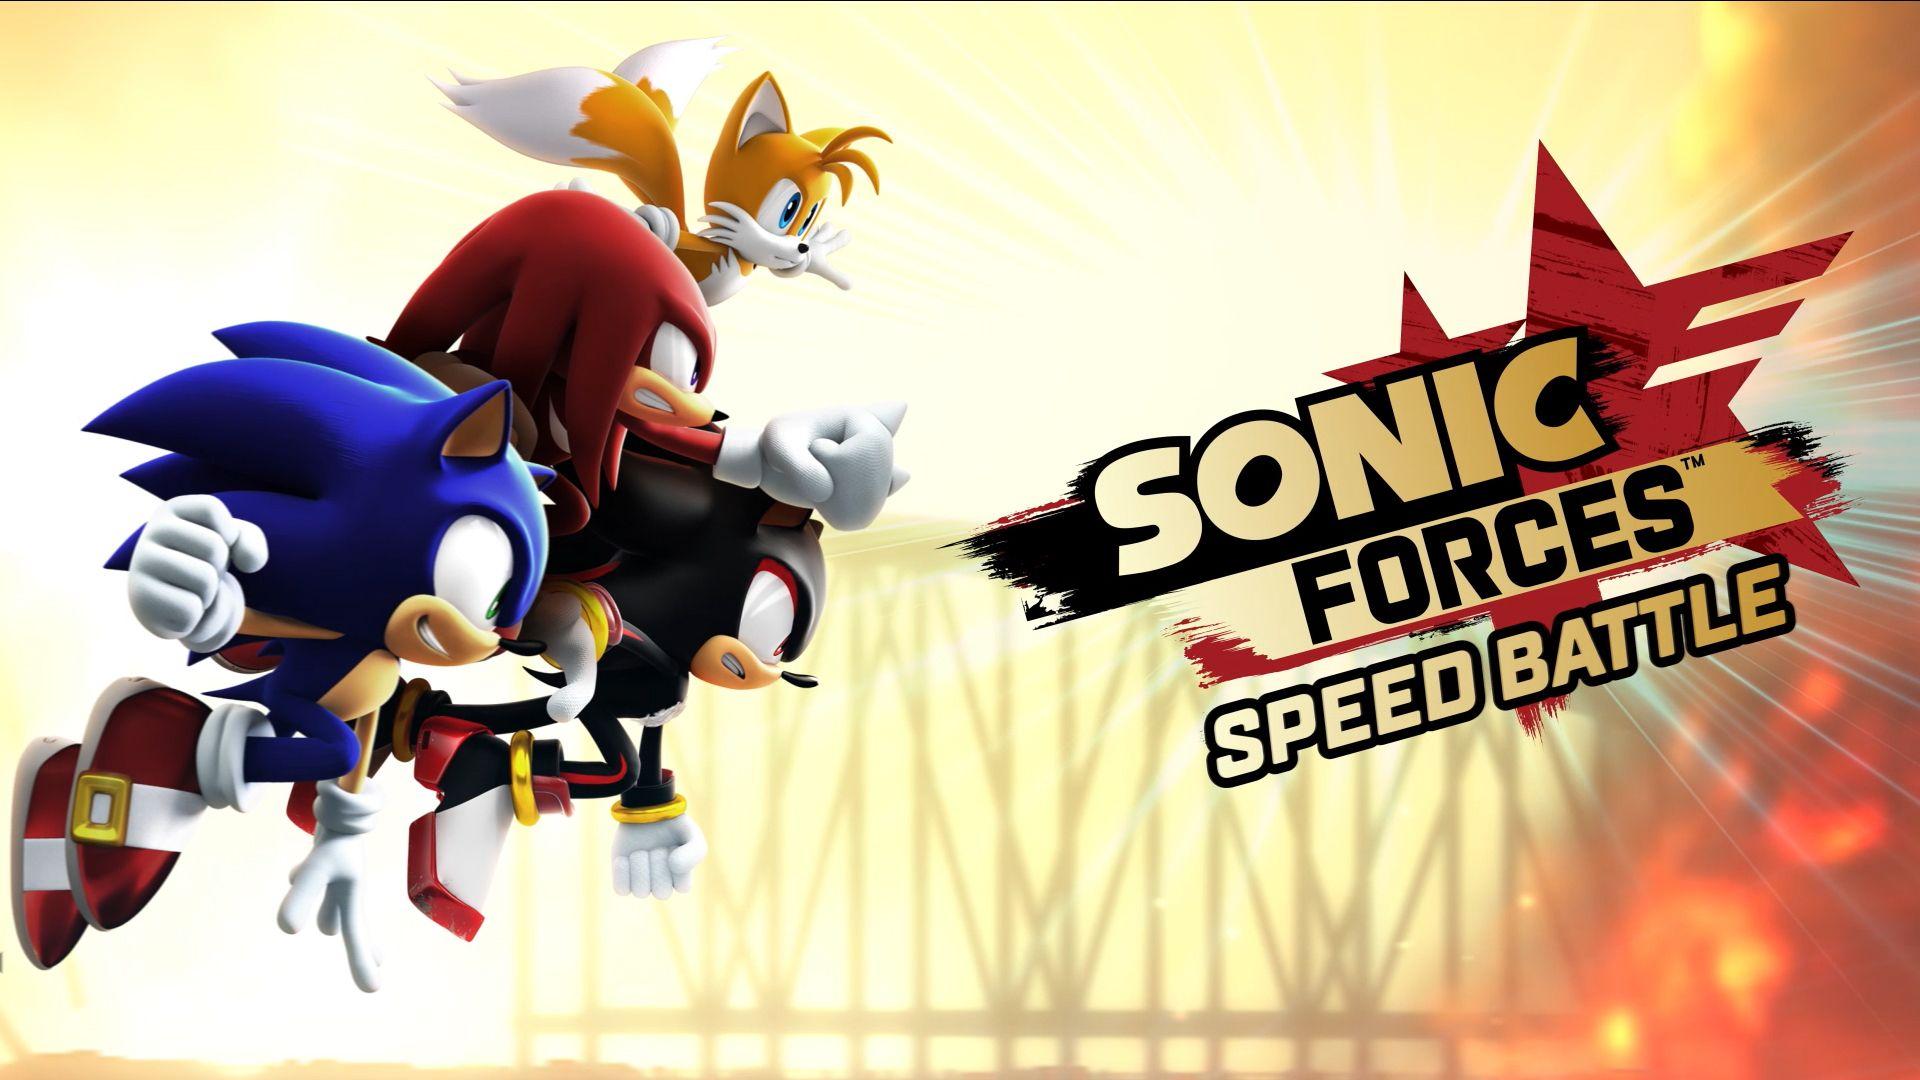 Improvements To Trophies Battle Sonic The Hedgehog Hip Hop Dj